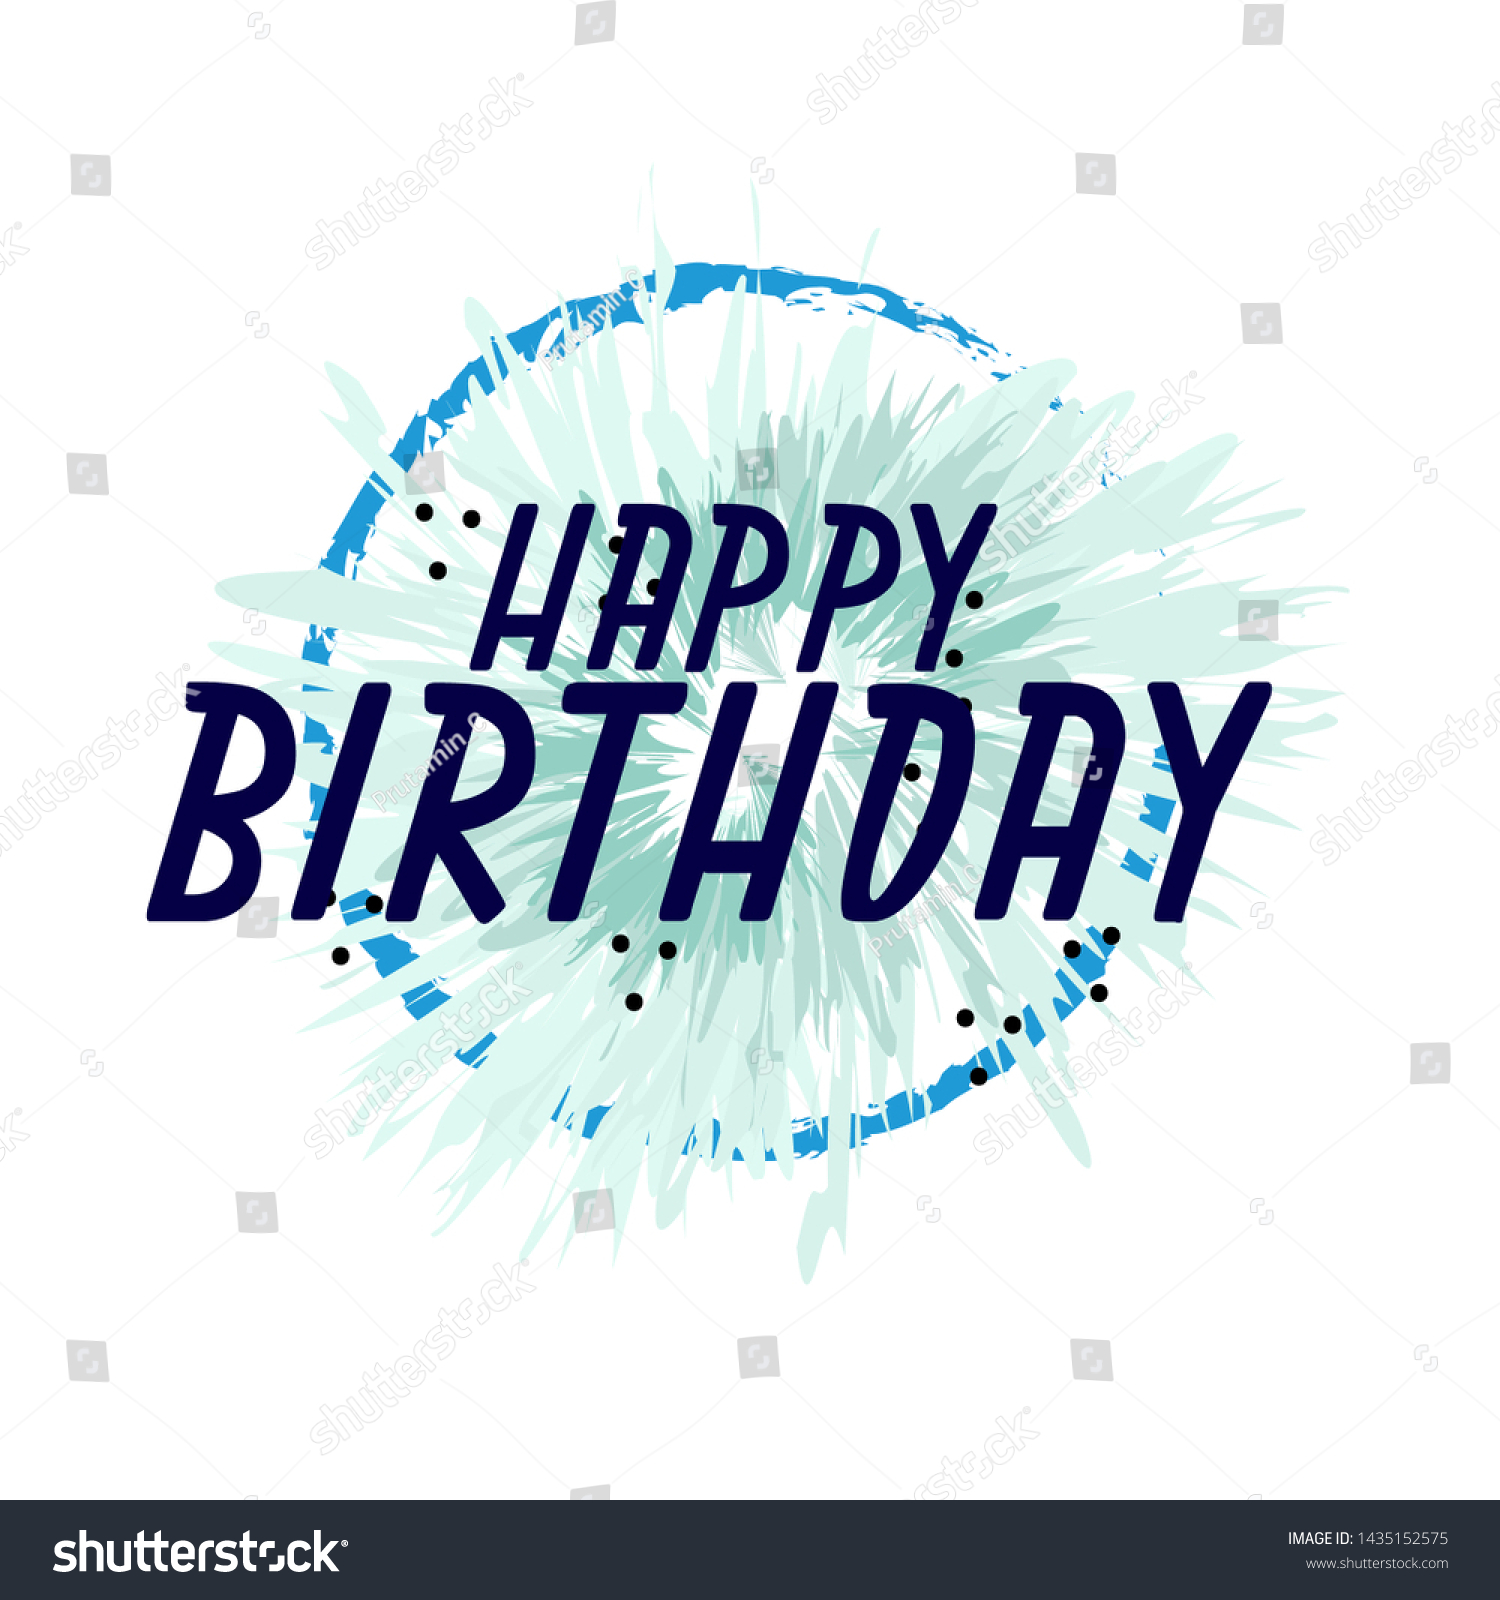 Phenomenal Happy Birthday Beautiful Greeting Card Background Stock Vector Funny Birthday Cards Online Barepcheapnameinfo